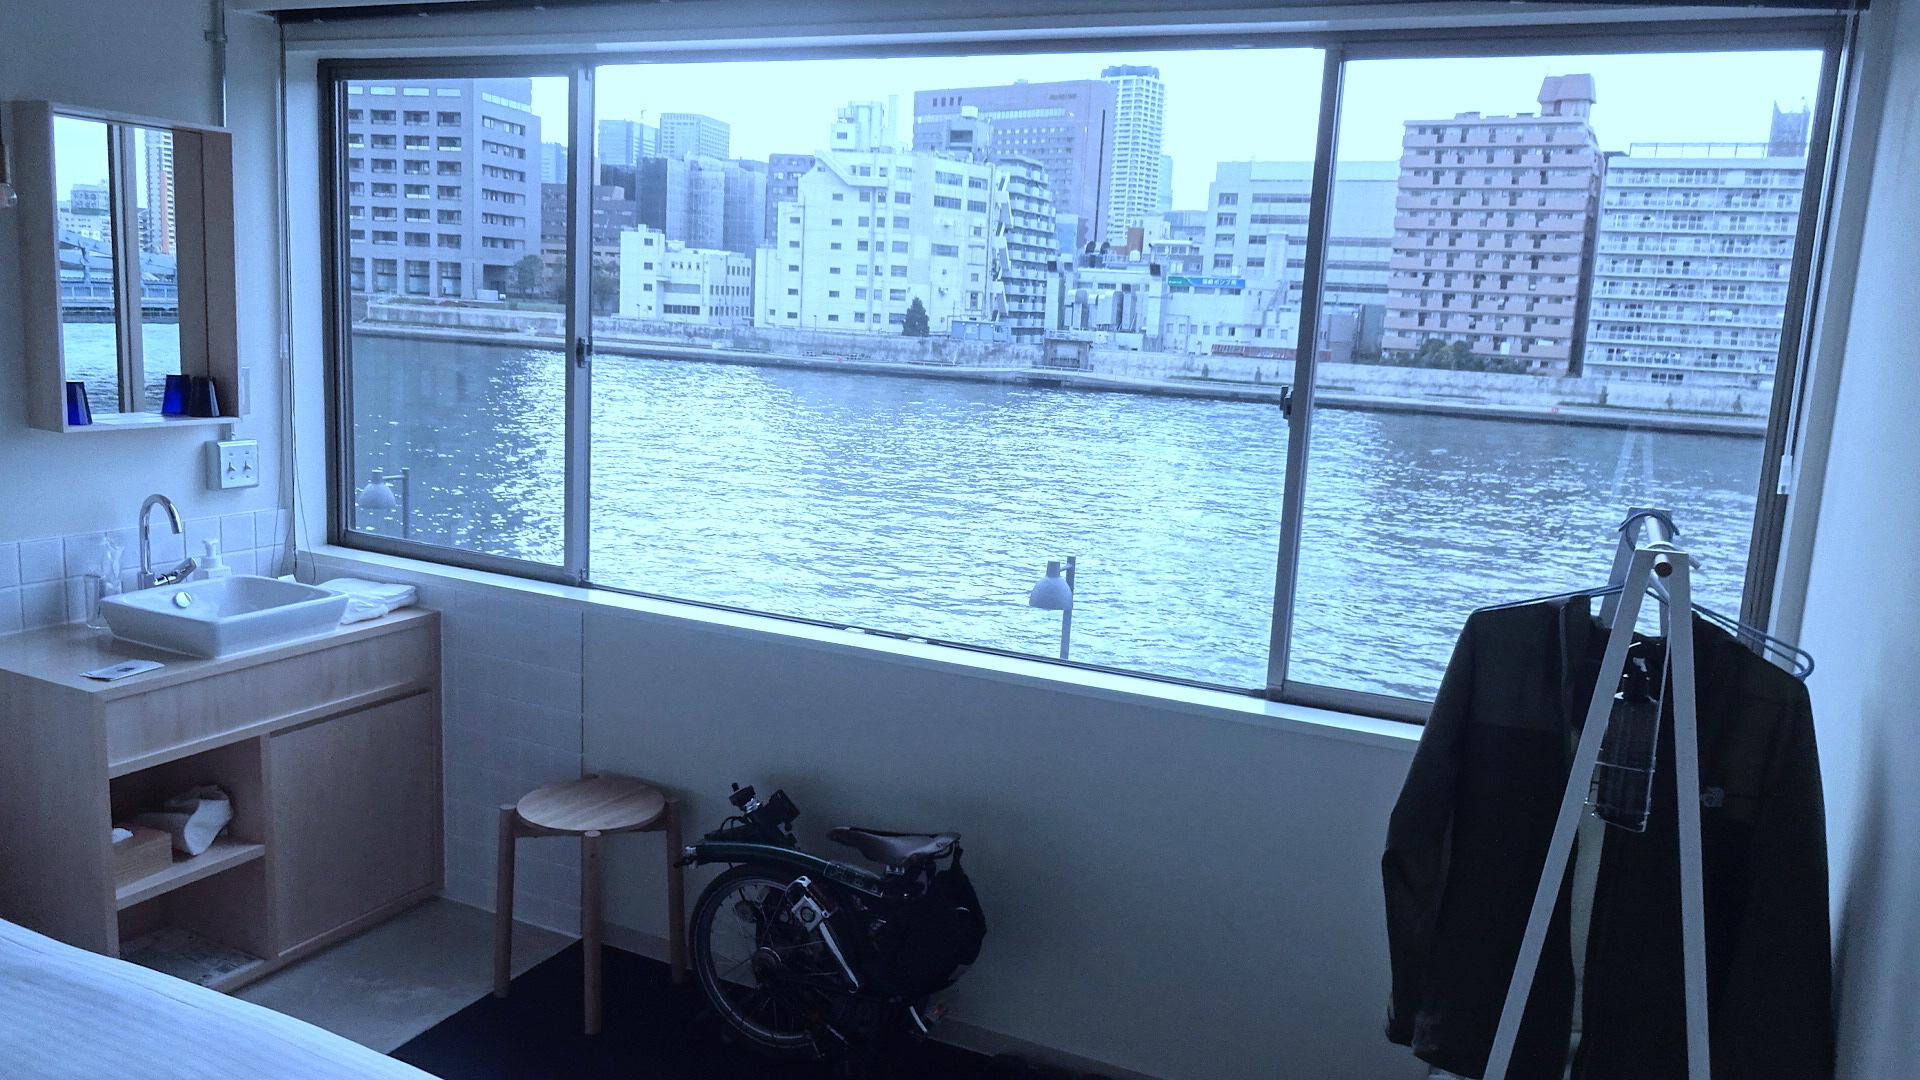 https://cdn-ak2.f.st-hatena.com/images/fotolife/s/shioshiohida/20171110/20171110150124_original.jpg